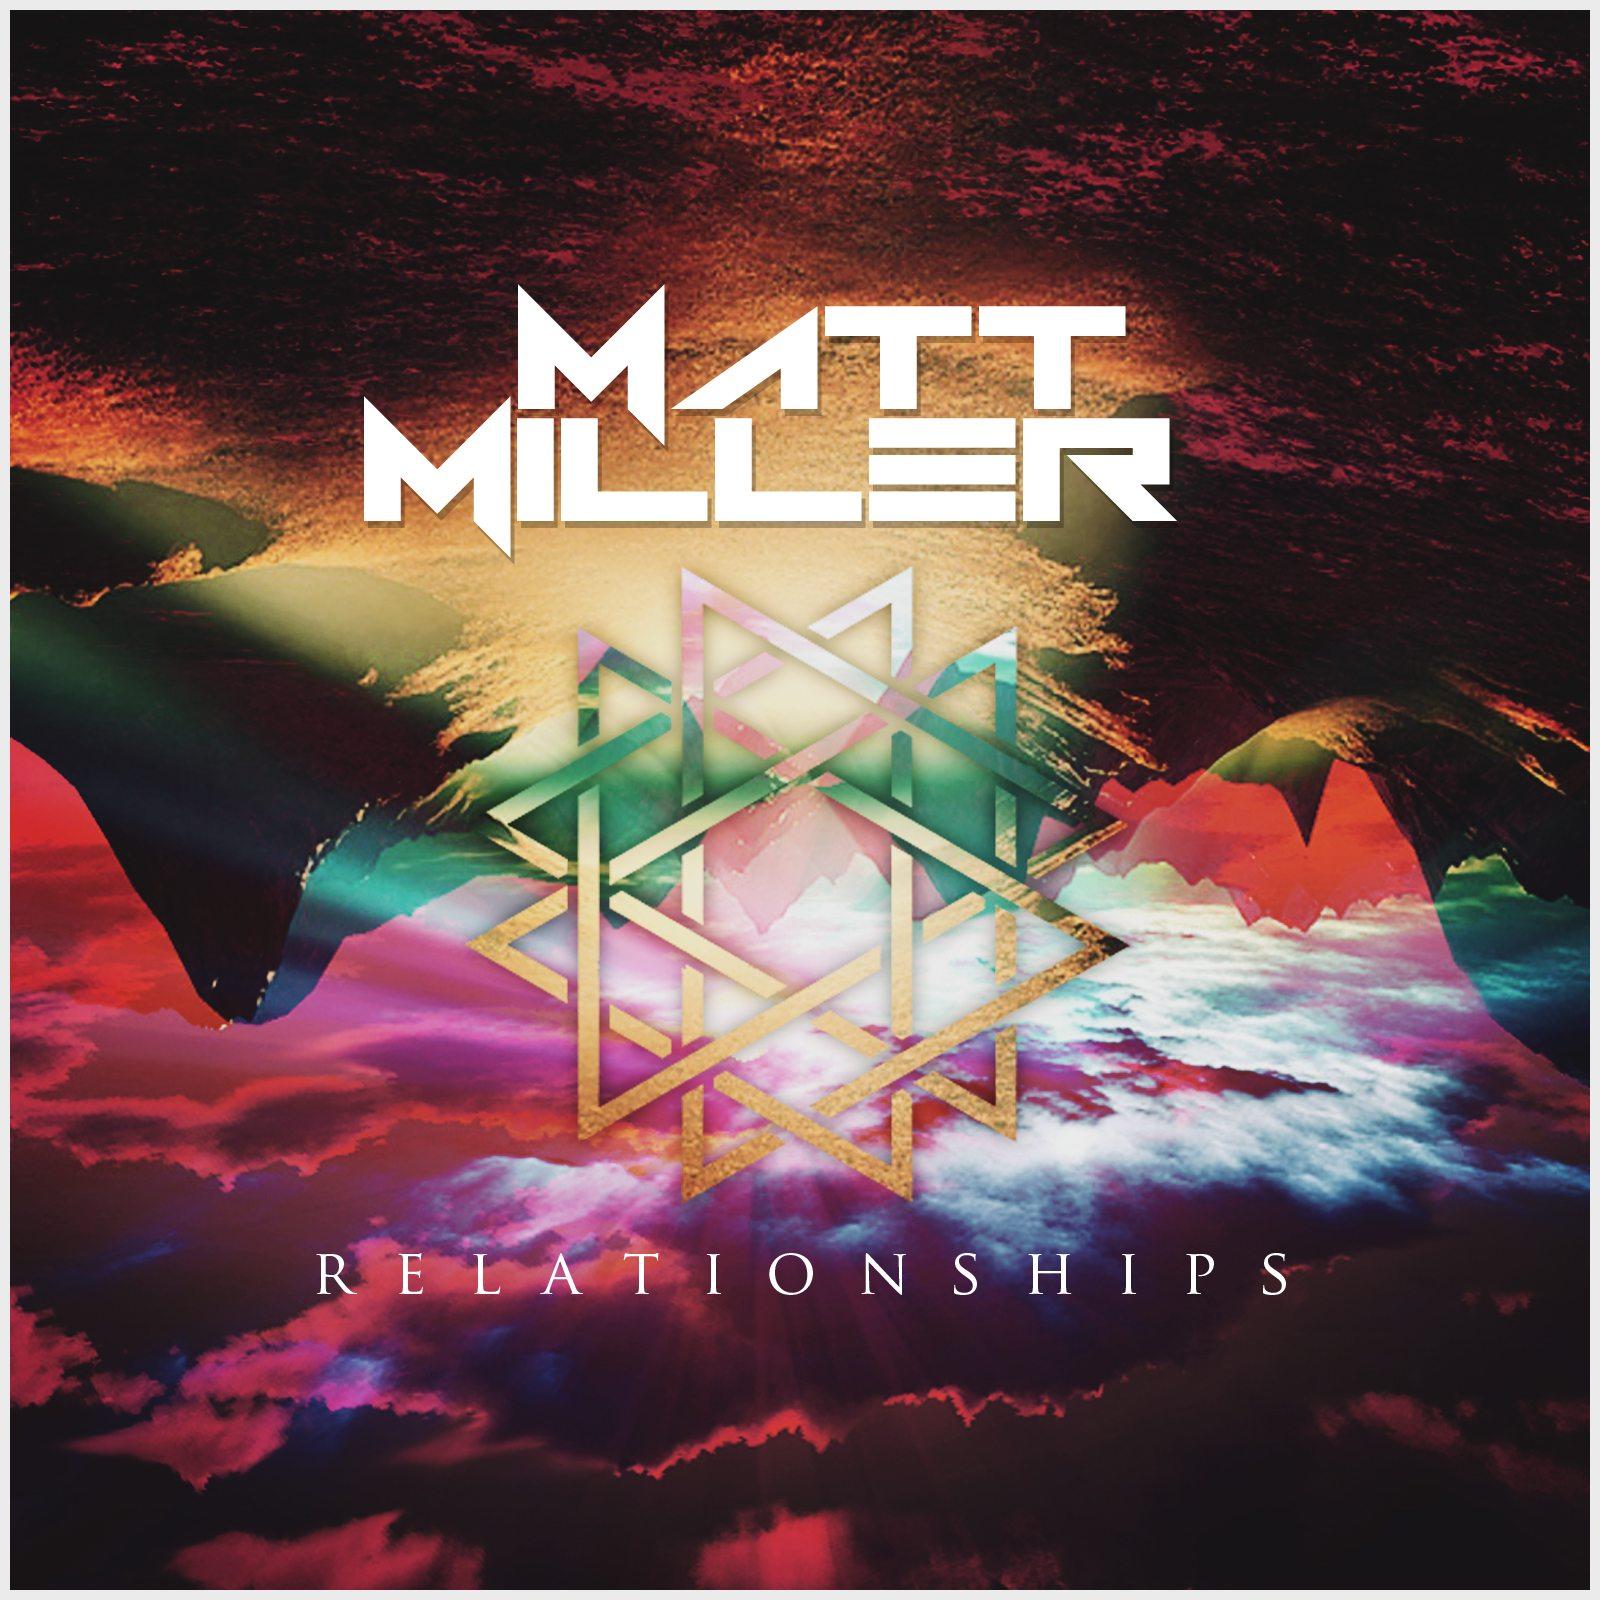 Relationships album